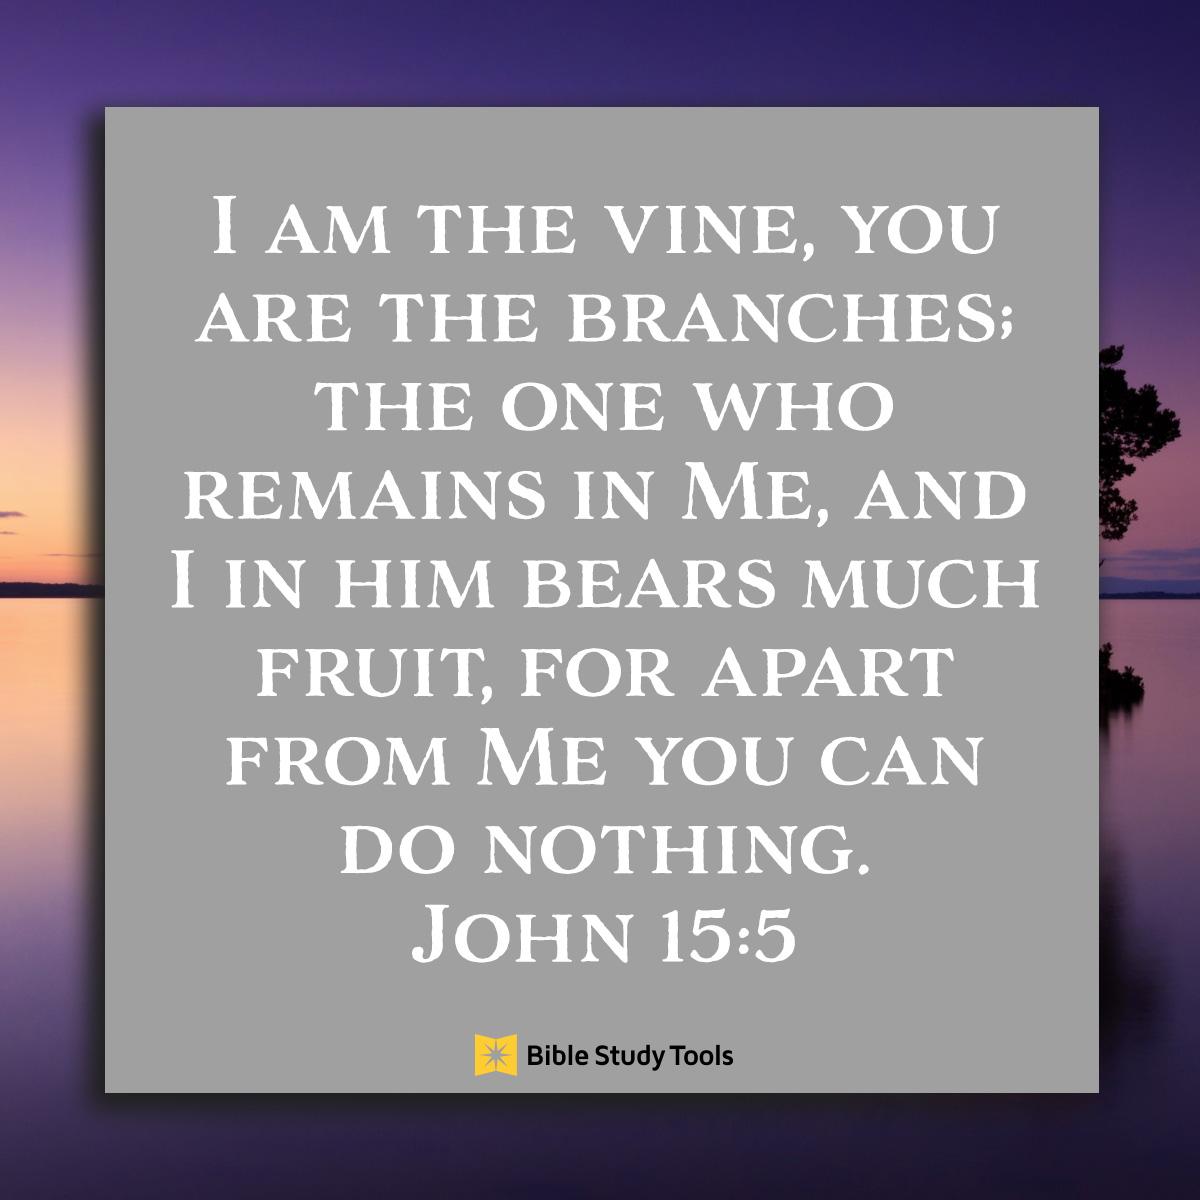 John 15:5, inspirational image